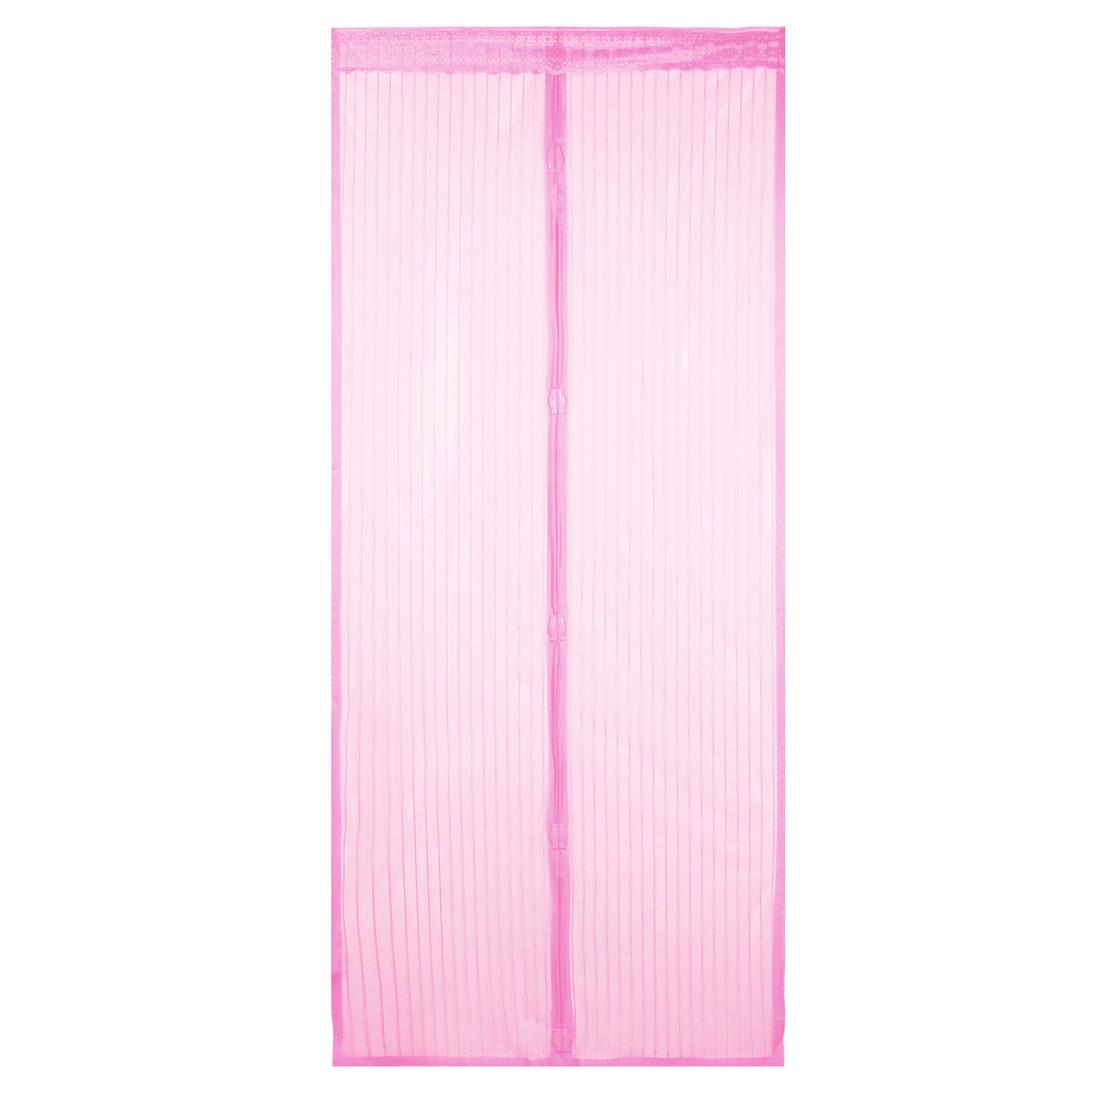 Dark Pink Magnetic Fly Screen Anti Mosquitoes Door Curtain 2.06 x 0.46m